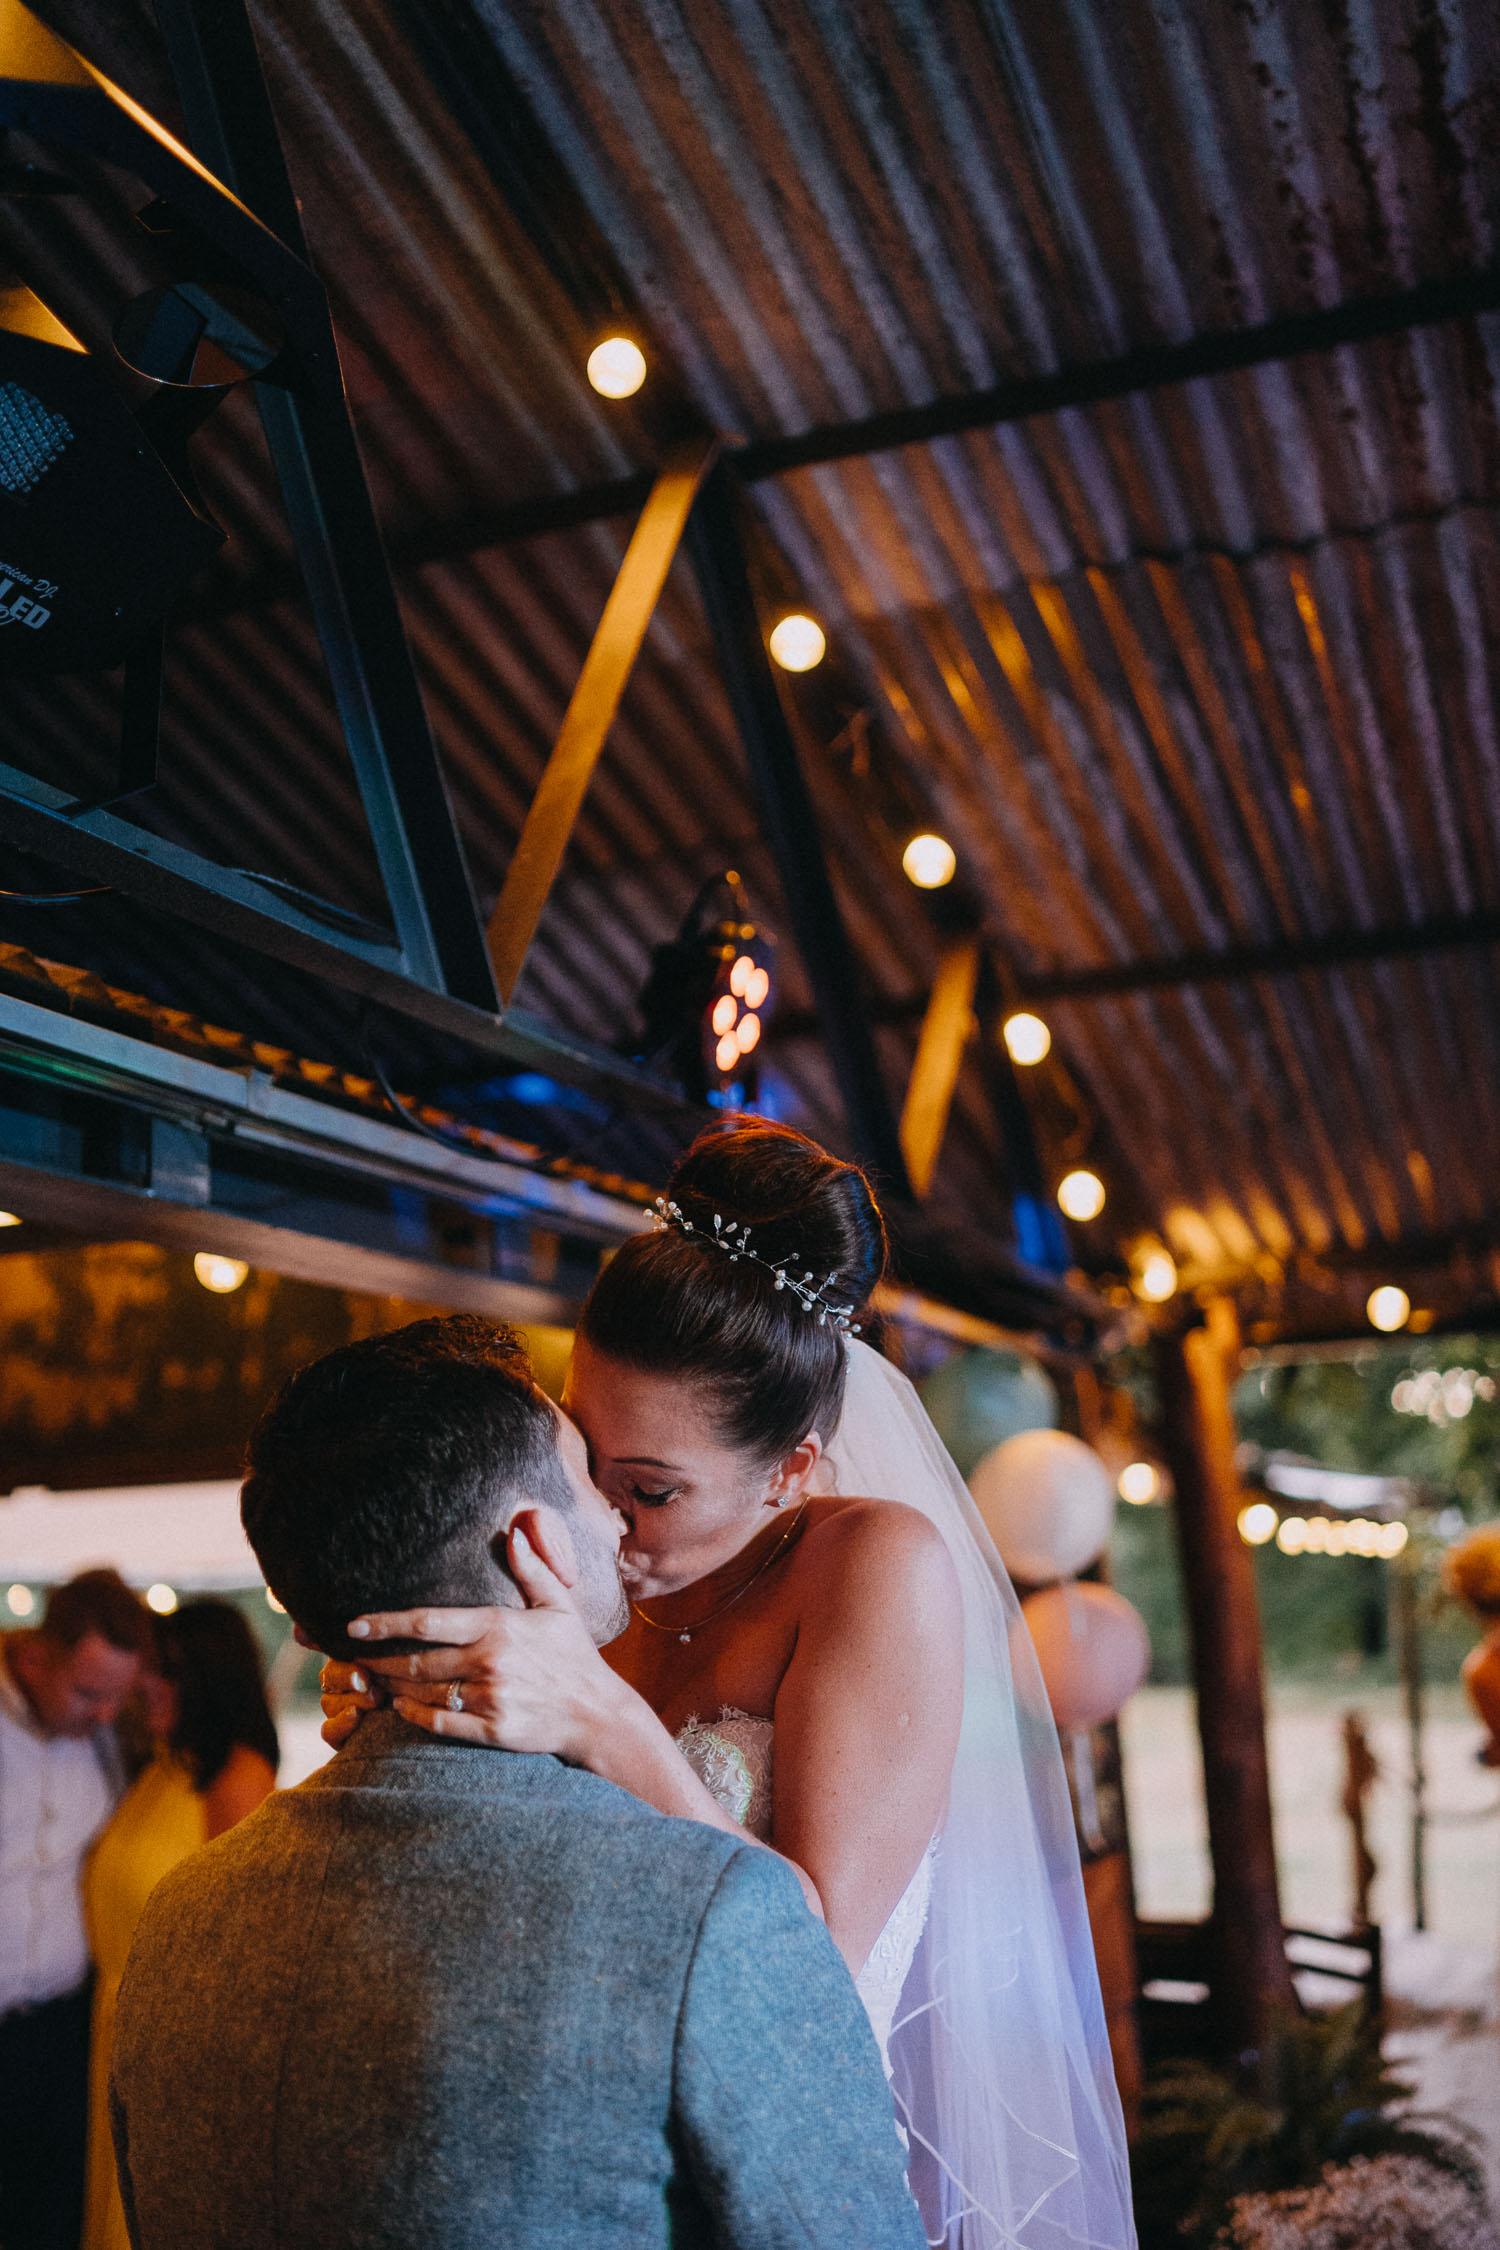 Alternative Wedding Photography in Kent, UK